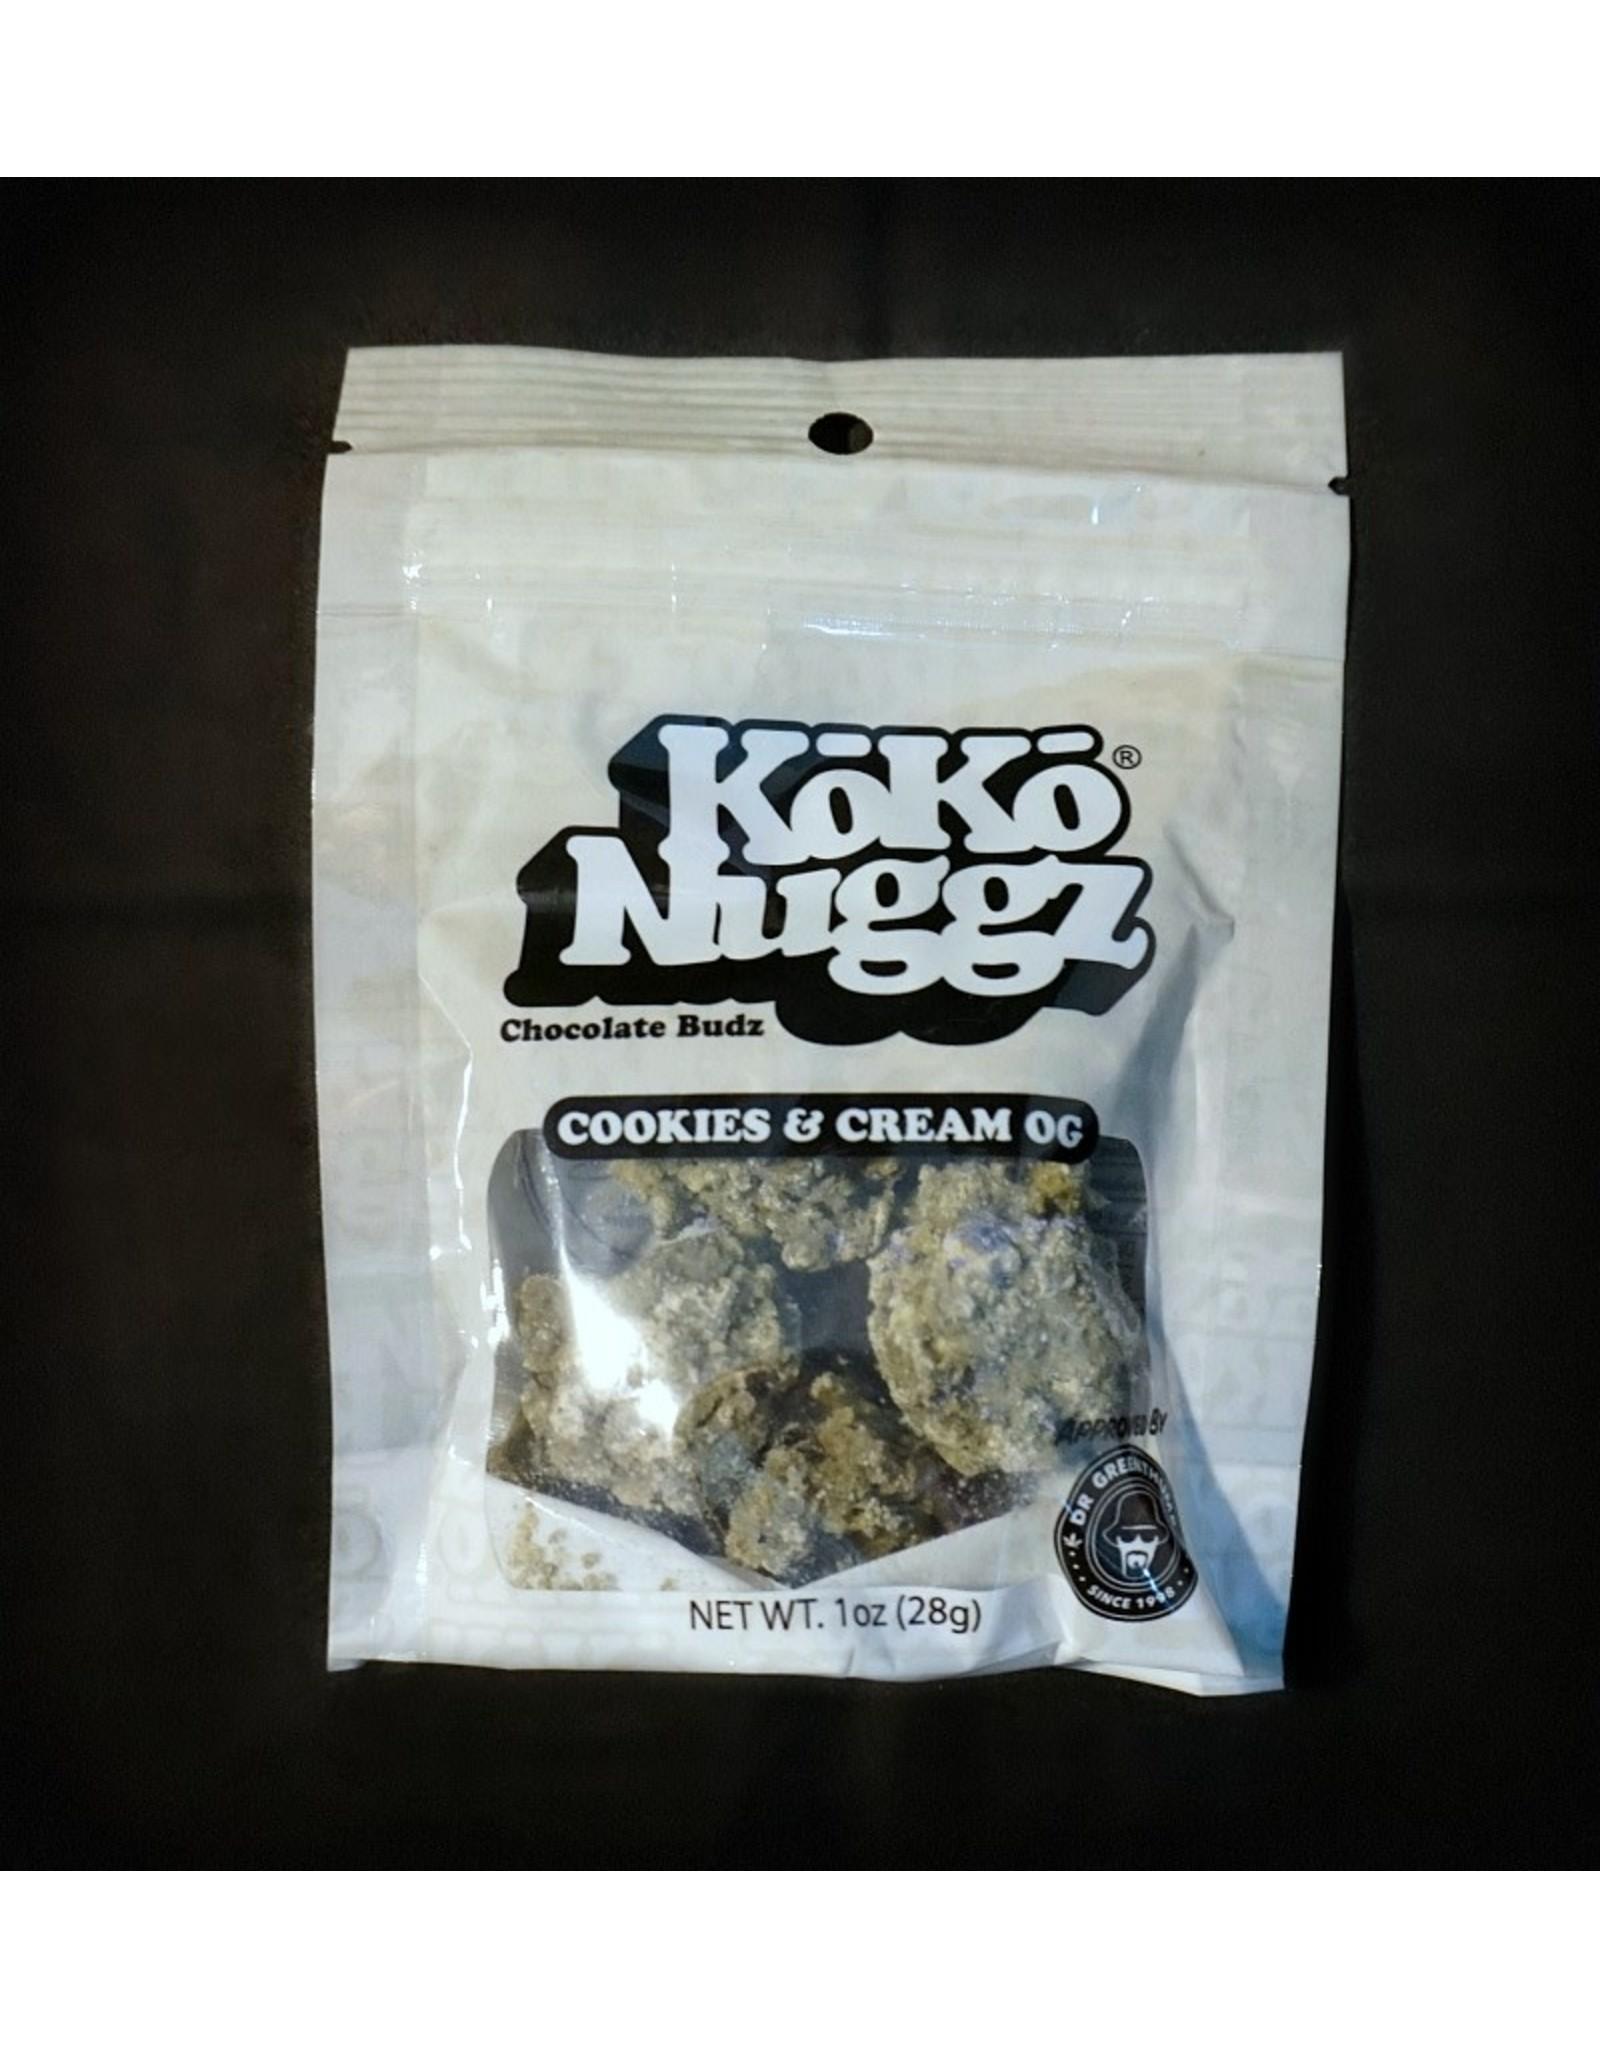 Koko Nuggz Koko Nuggz Cookies and Cream